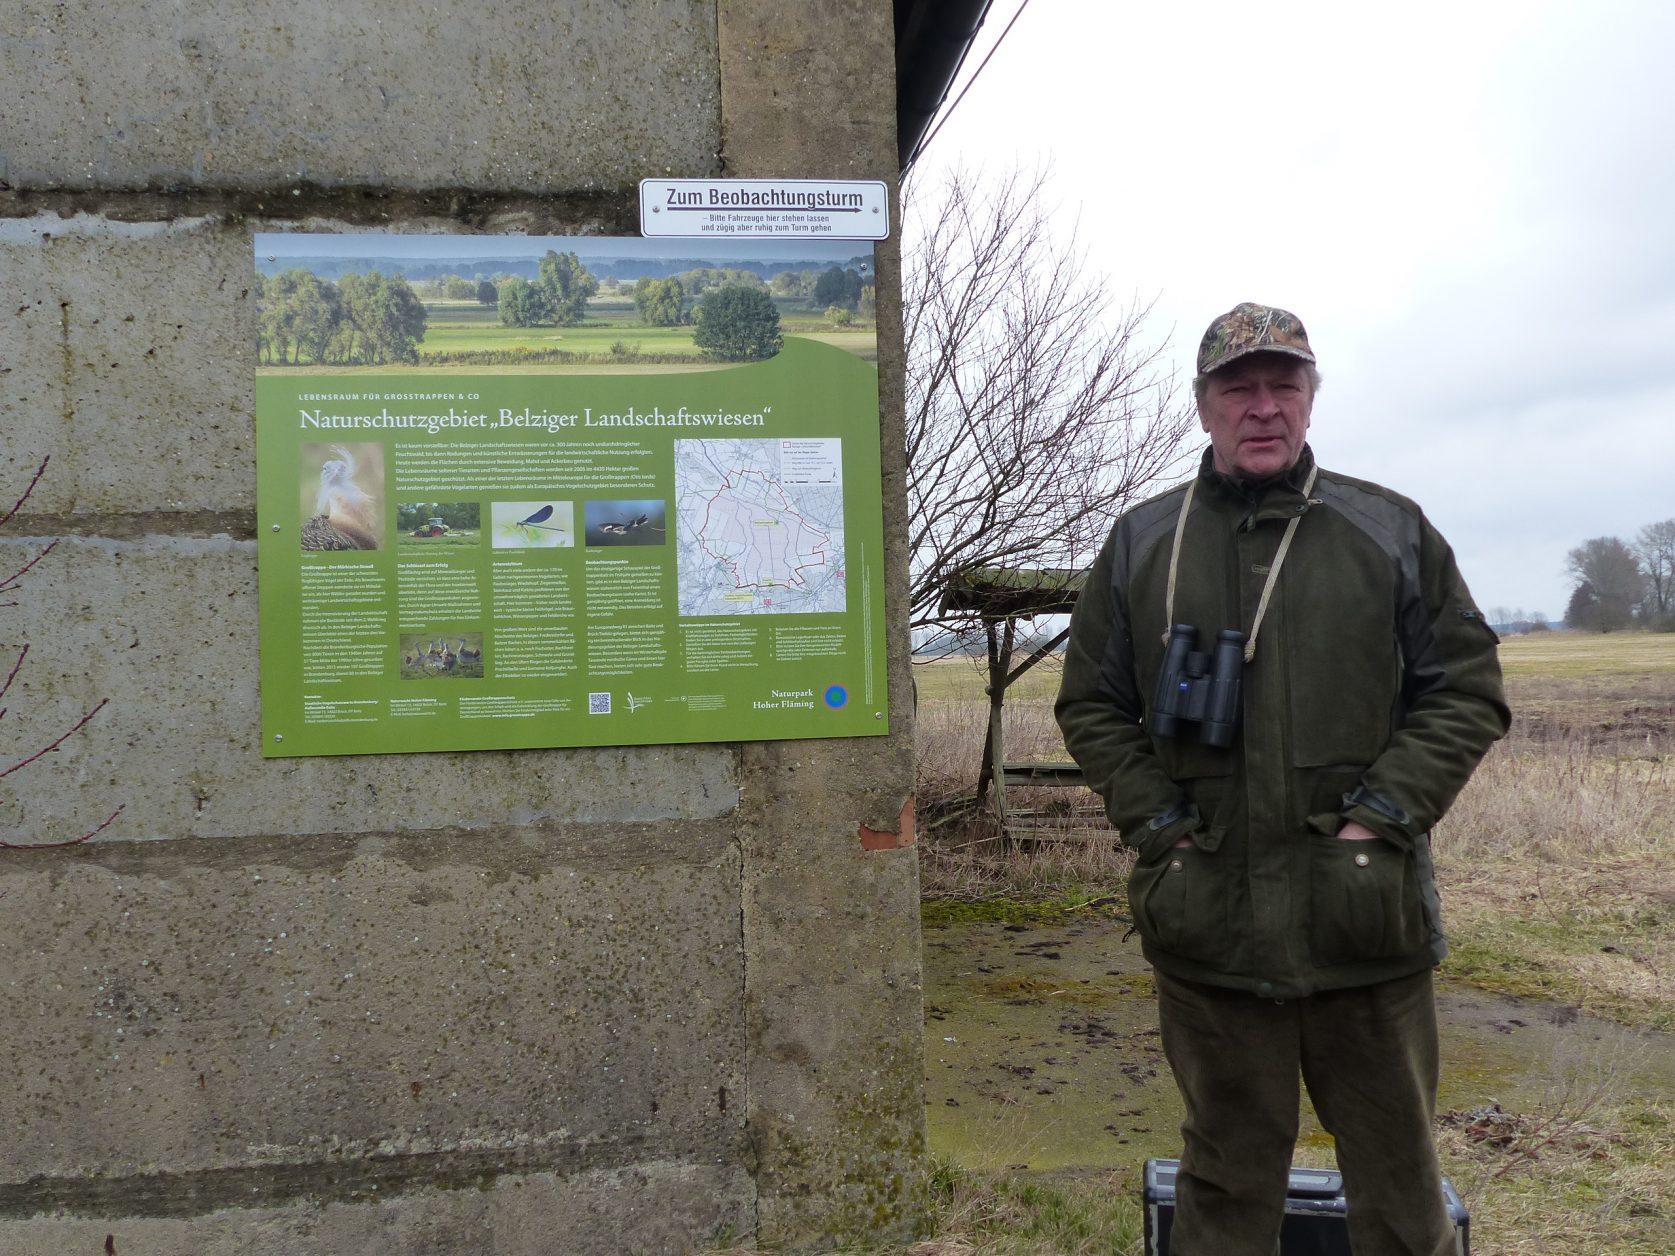 Norbert Eschholz kümmert sich um die Großtrappen in den Belziger Landschaftswiesen Foto: Weirauch